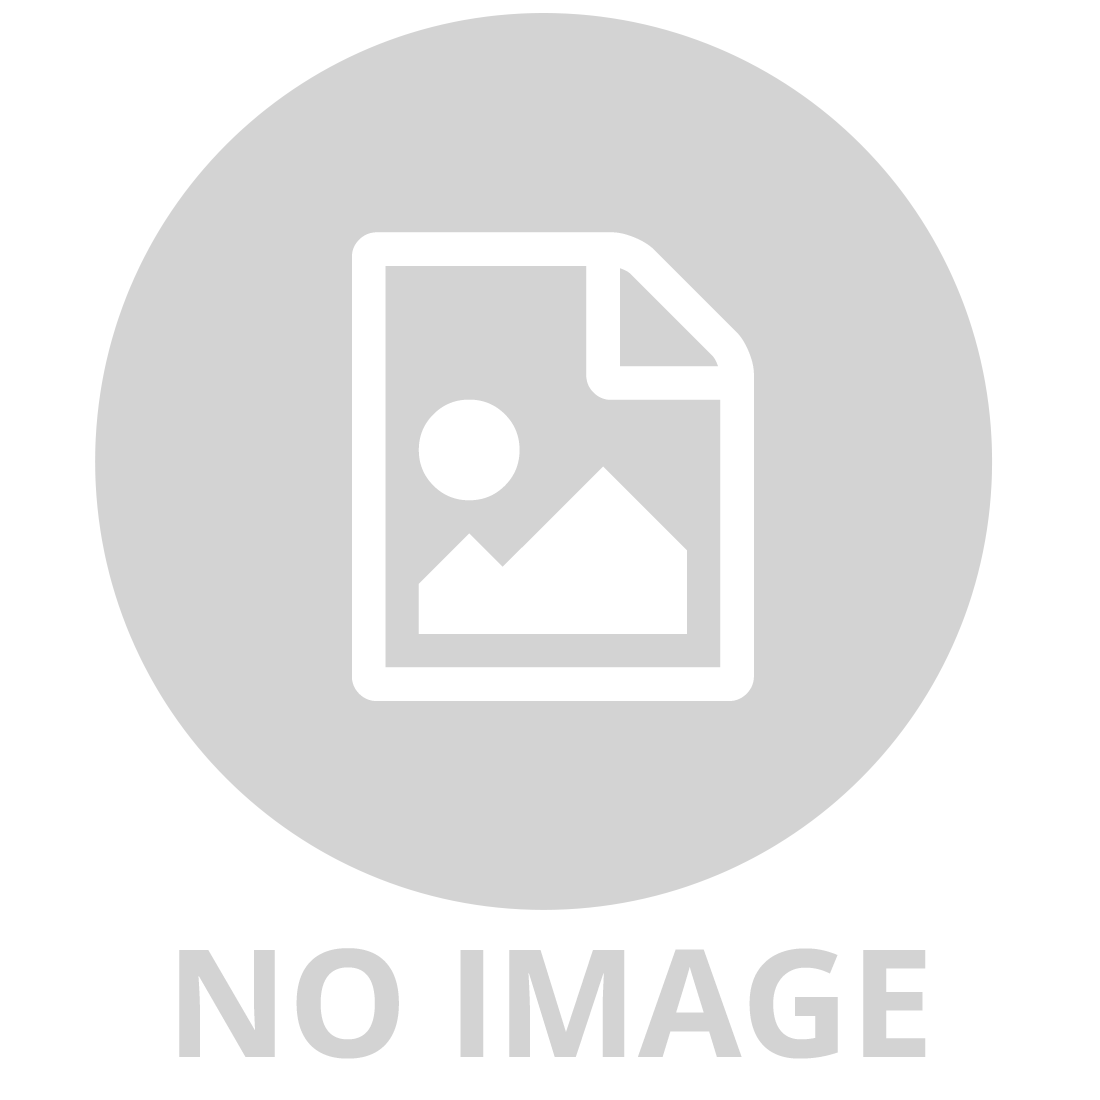 LEGO NINJAGO 70635 JAY - SPINJITZU MASTER